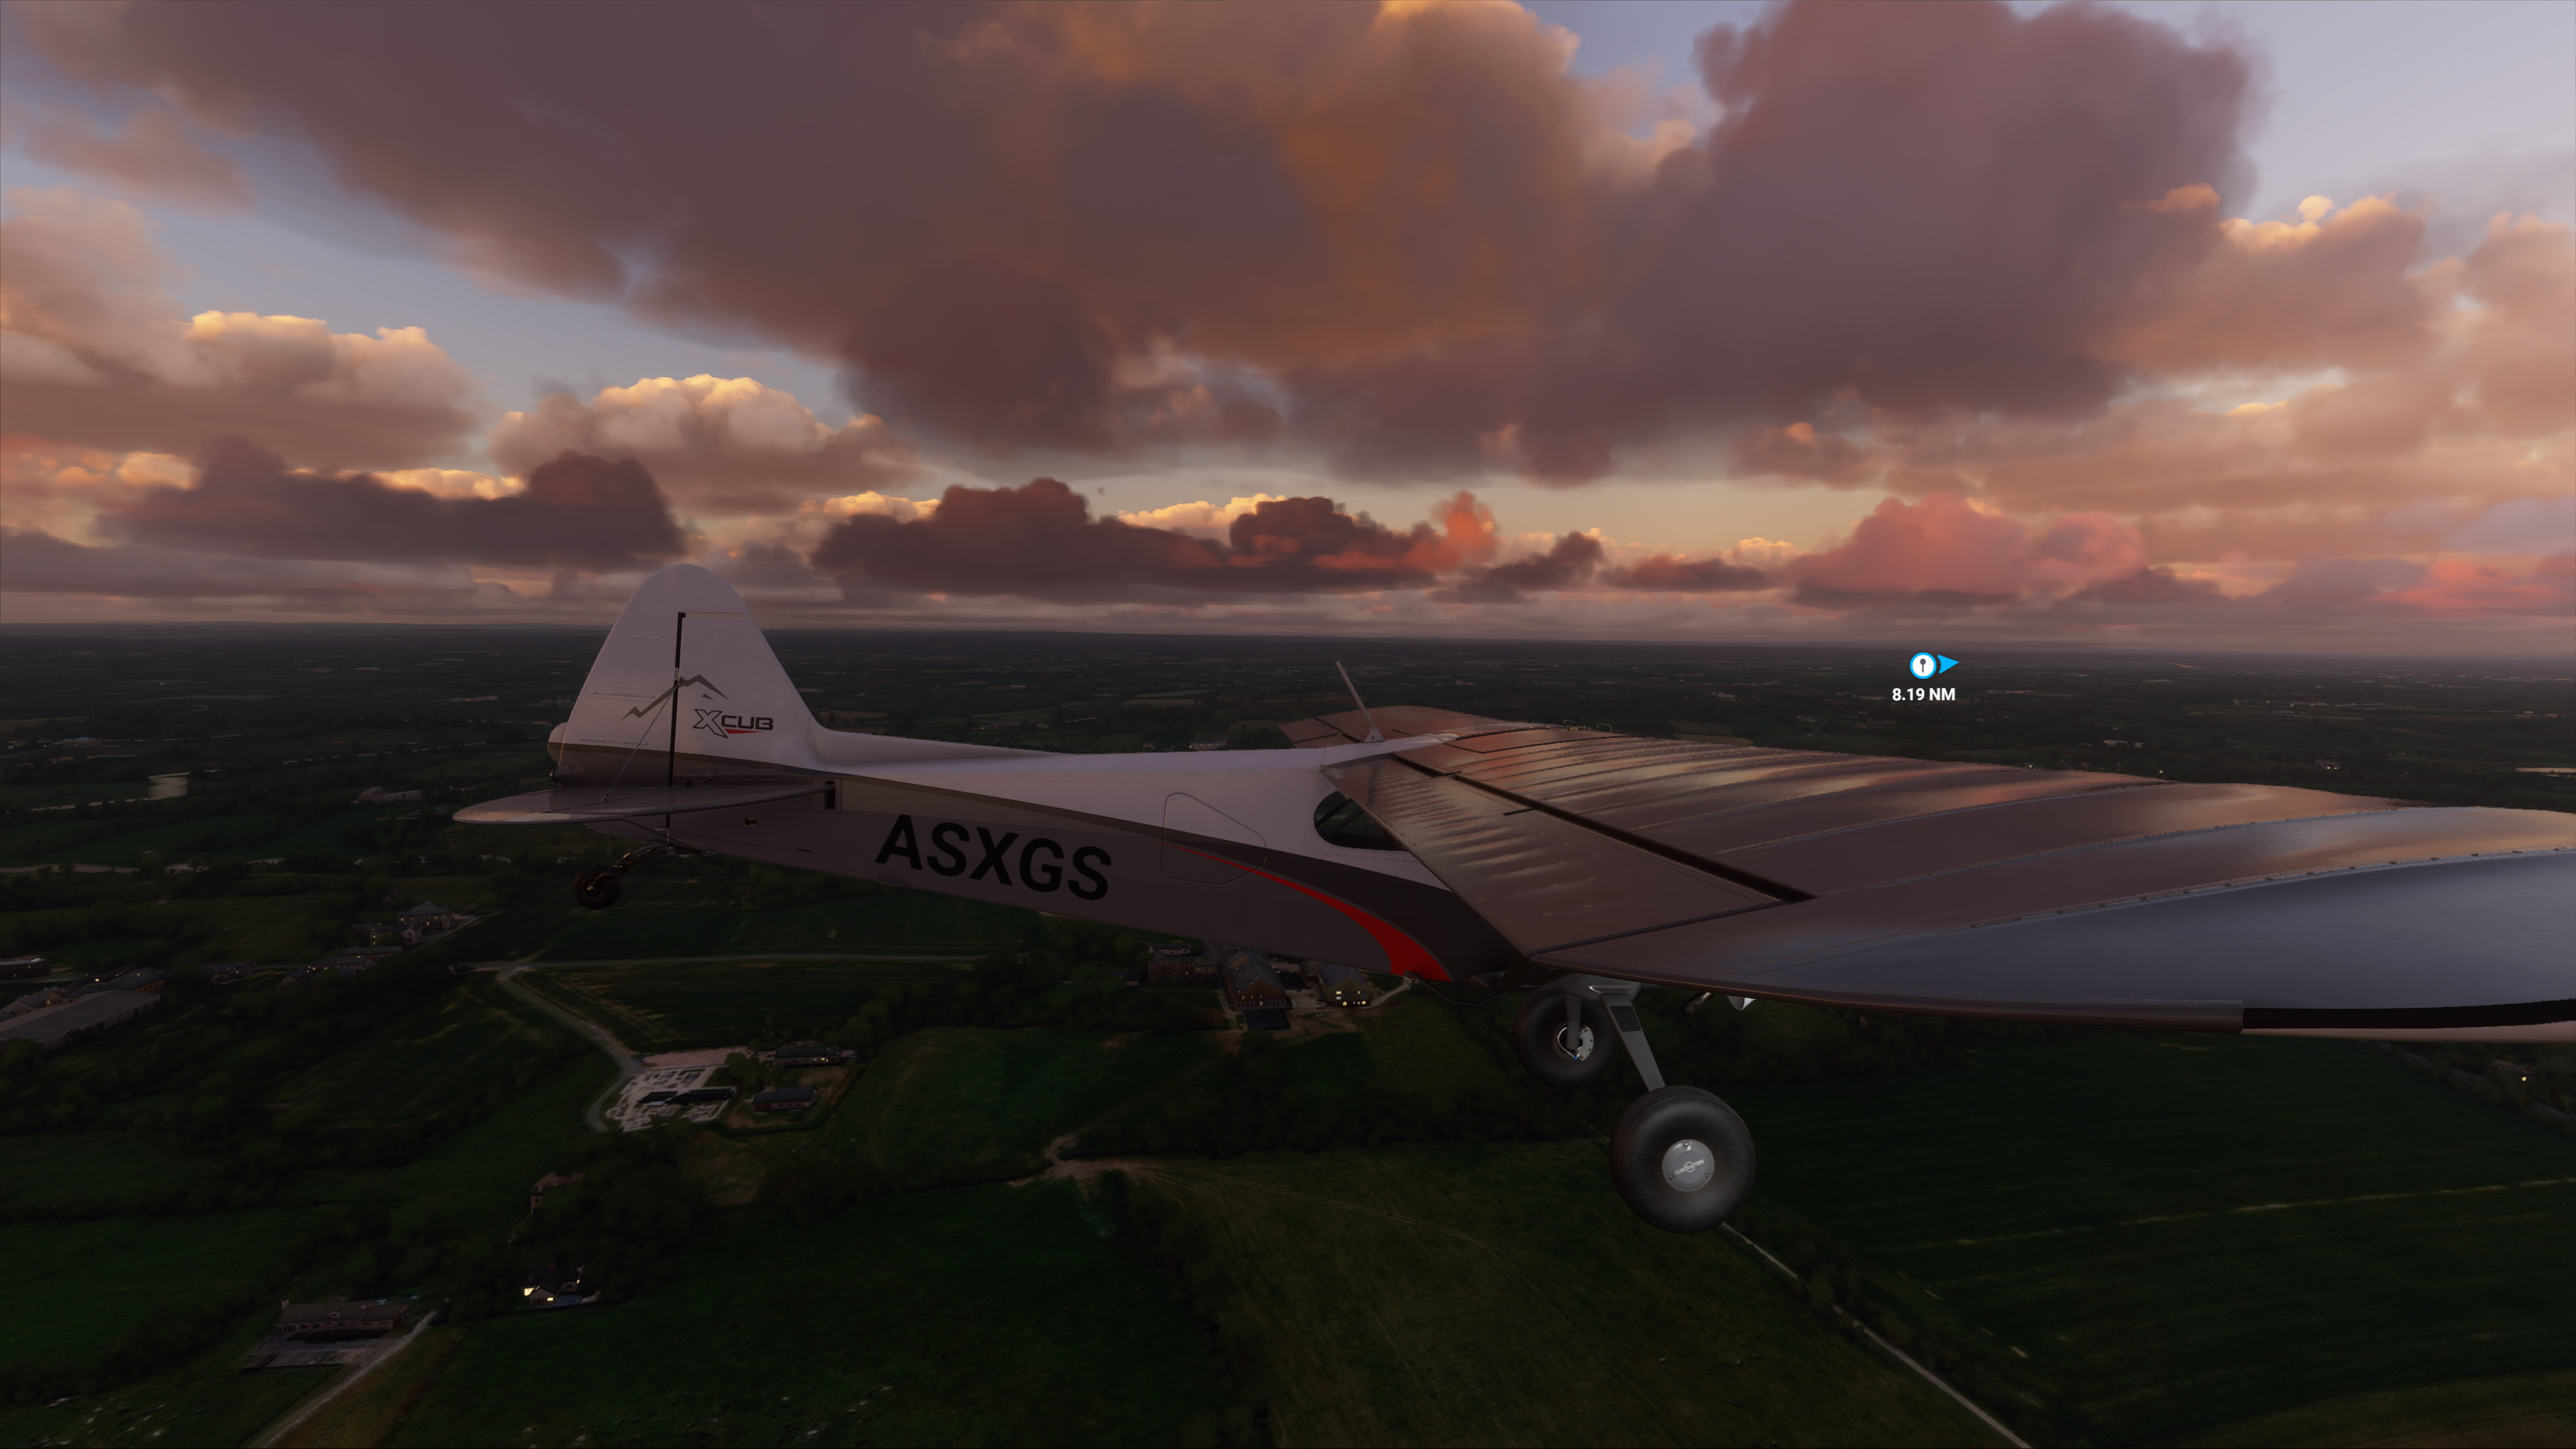 Microsoft Flight Simulator 2020 will download satellite imaging data to improve visual quality.